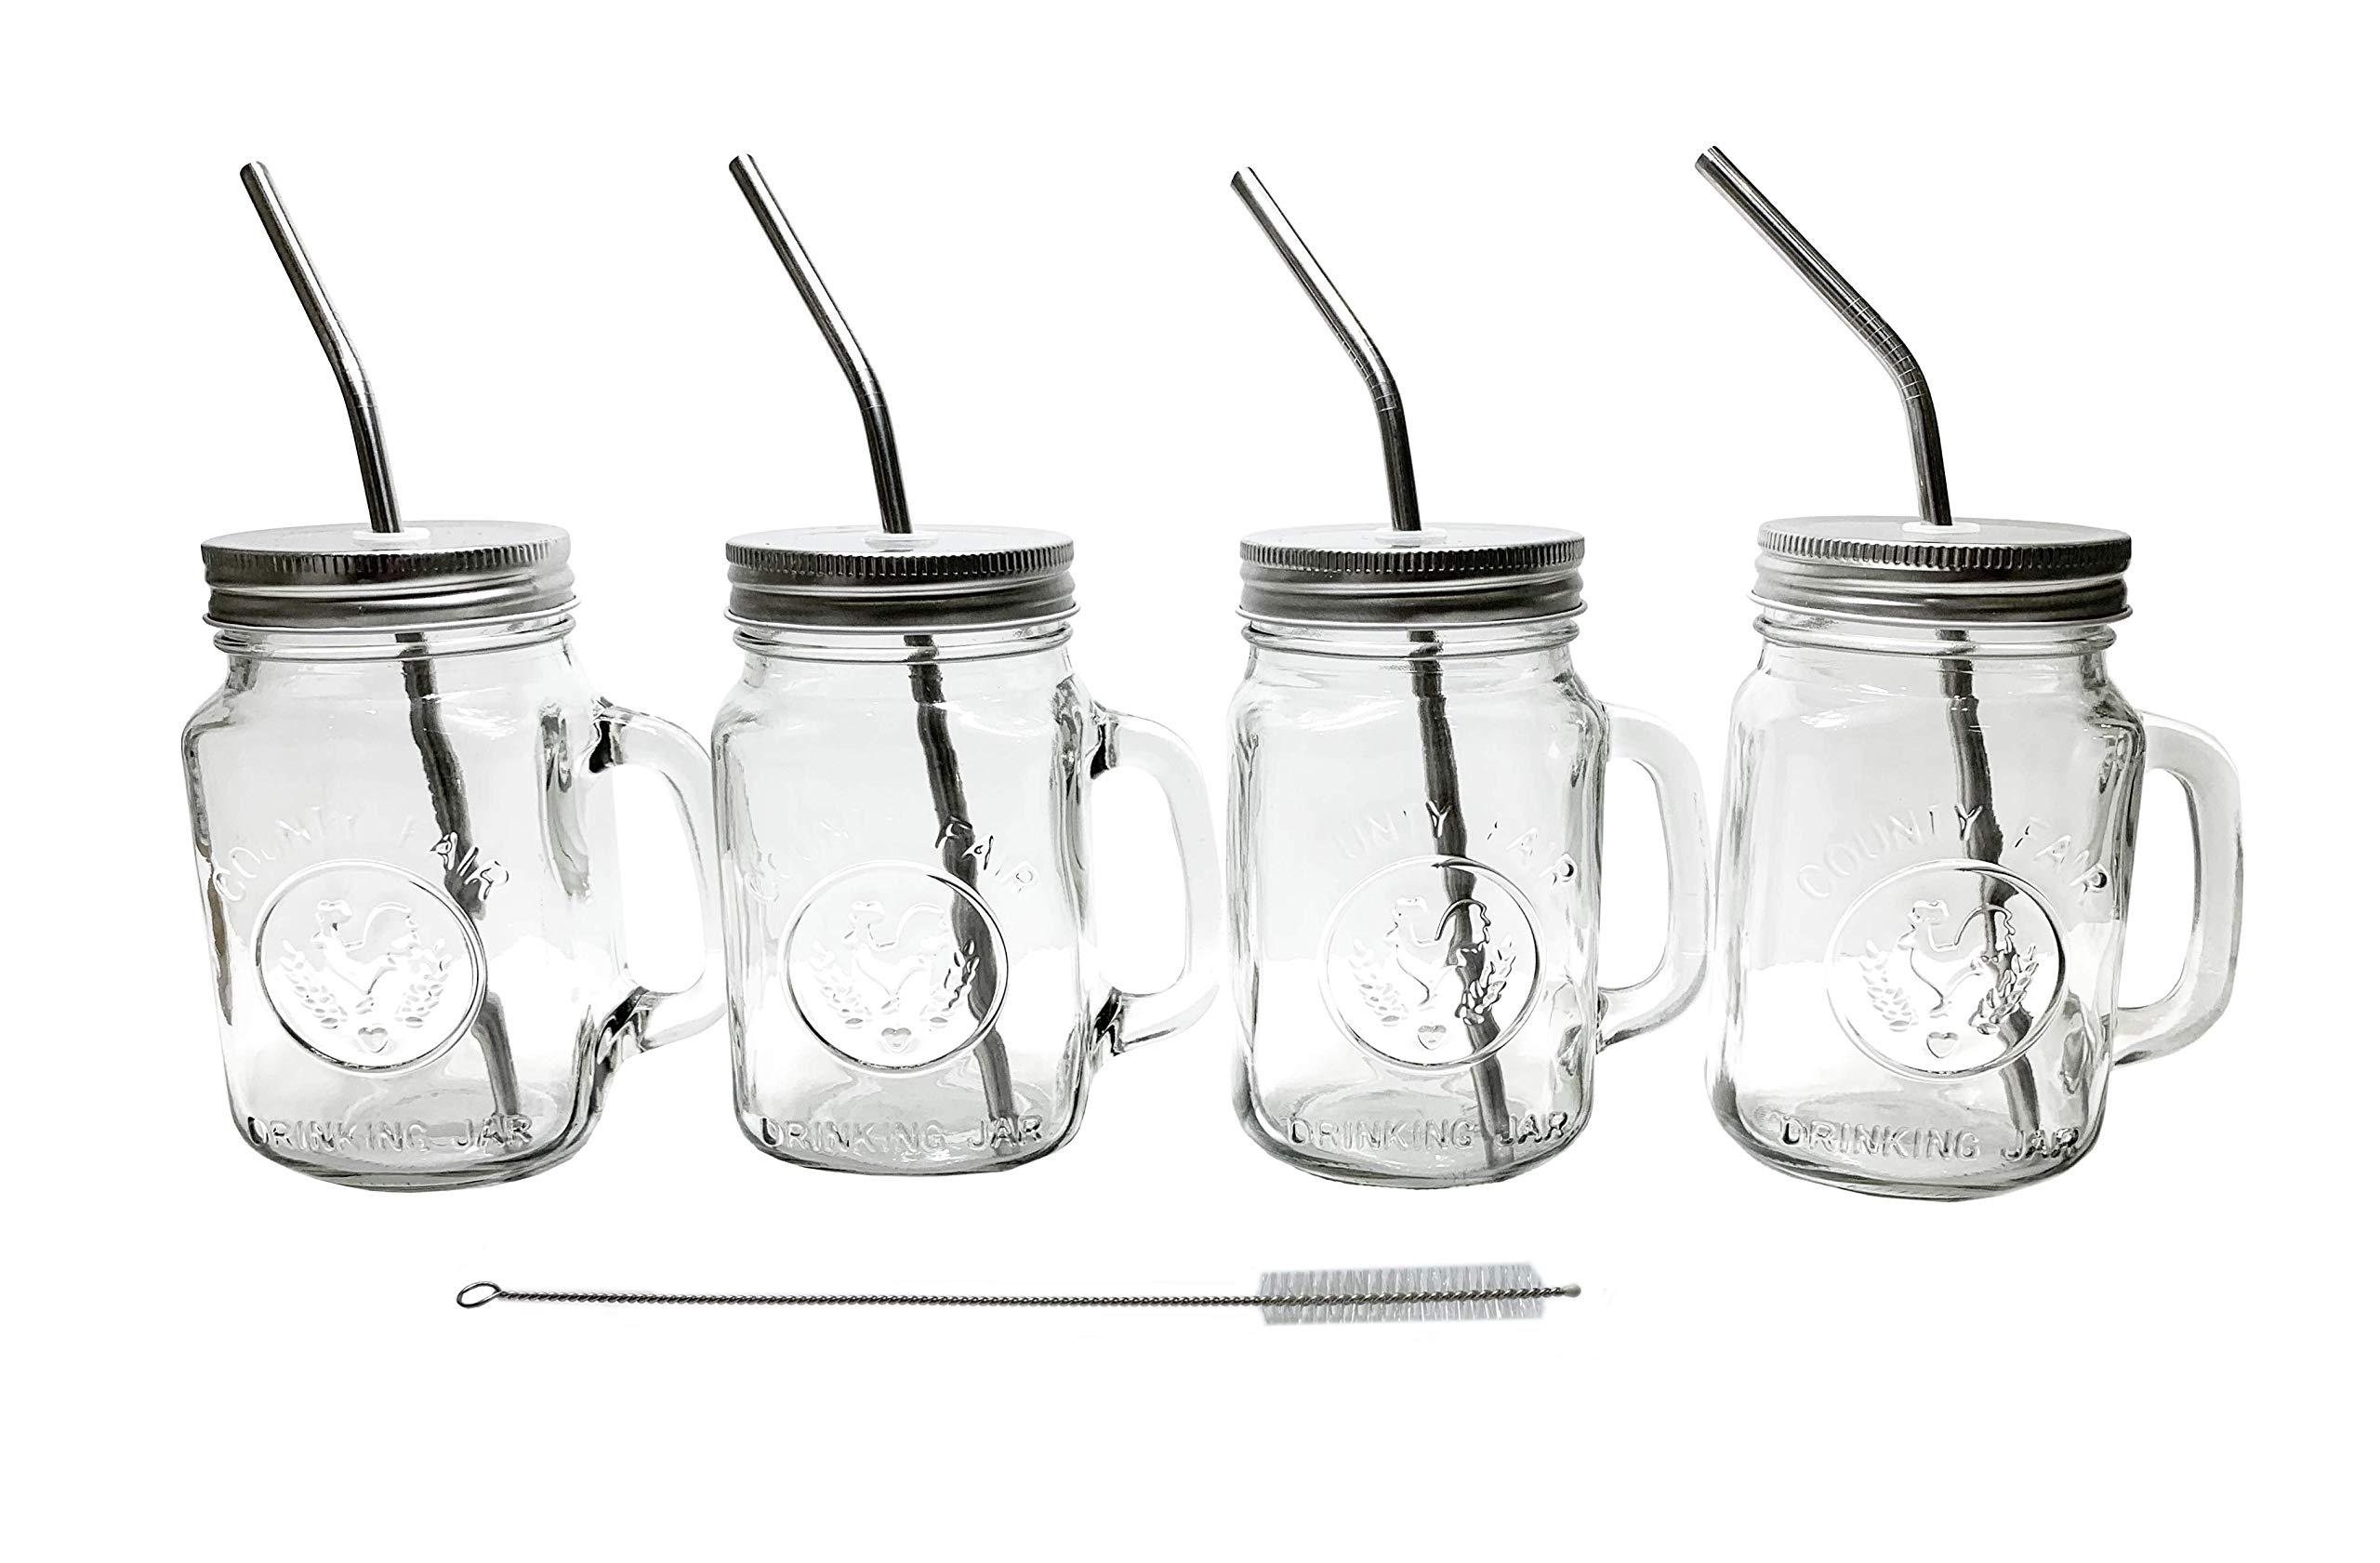 Mason Jar Mugs with Glass Handles and Metal Straws, Brimley 16oz Drinking Glasses Set of 4 by Brimley